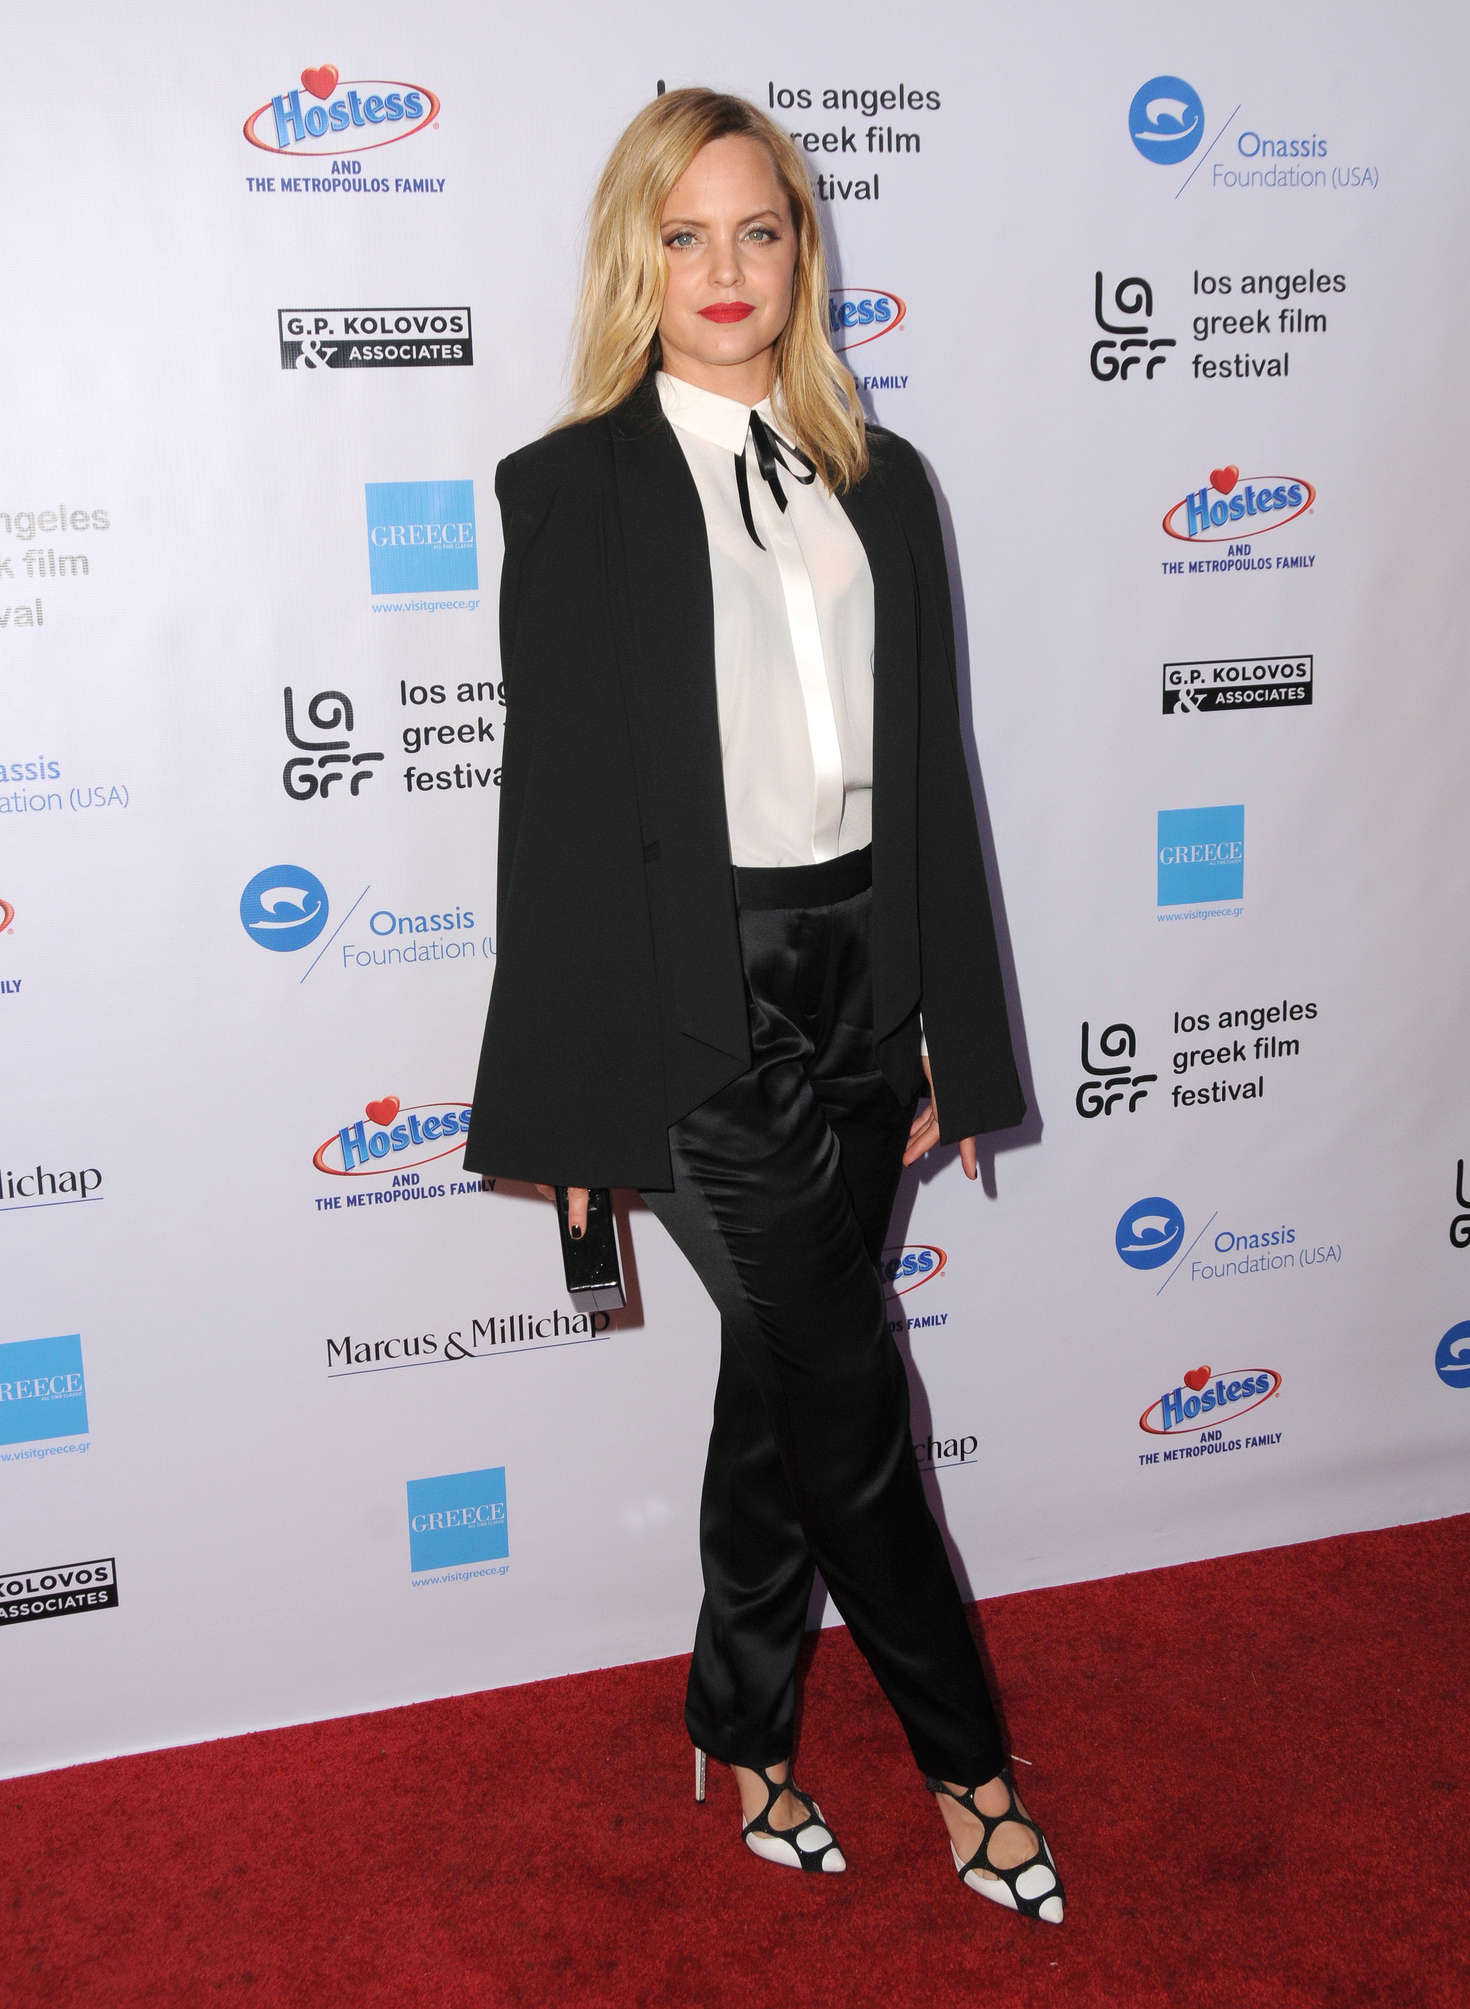 Mena Suvari 2016 : Mena Suvari: Worlds Apart Premiere at 2016 LA Greek Film Festival -01